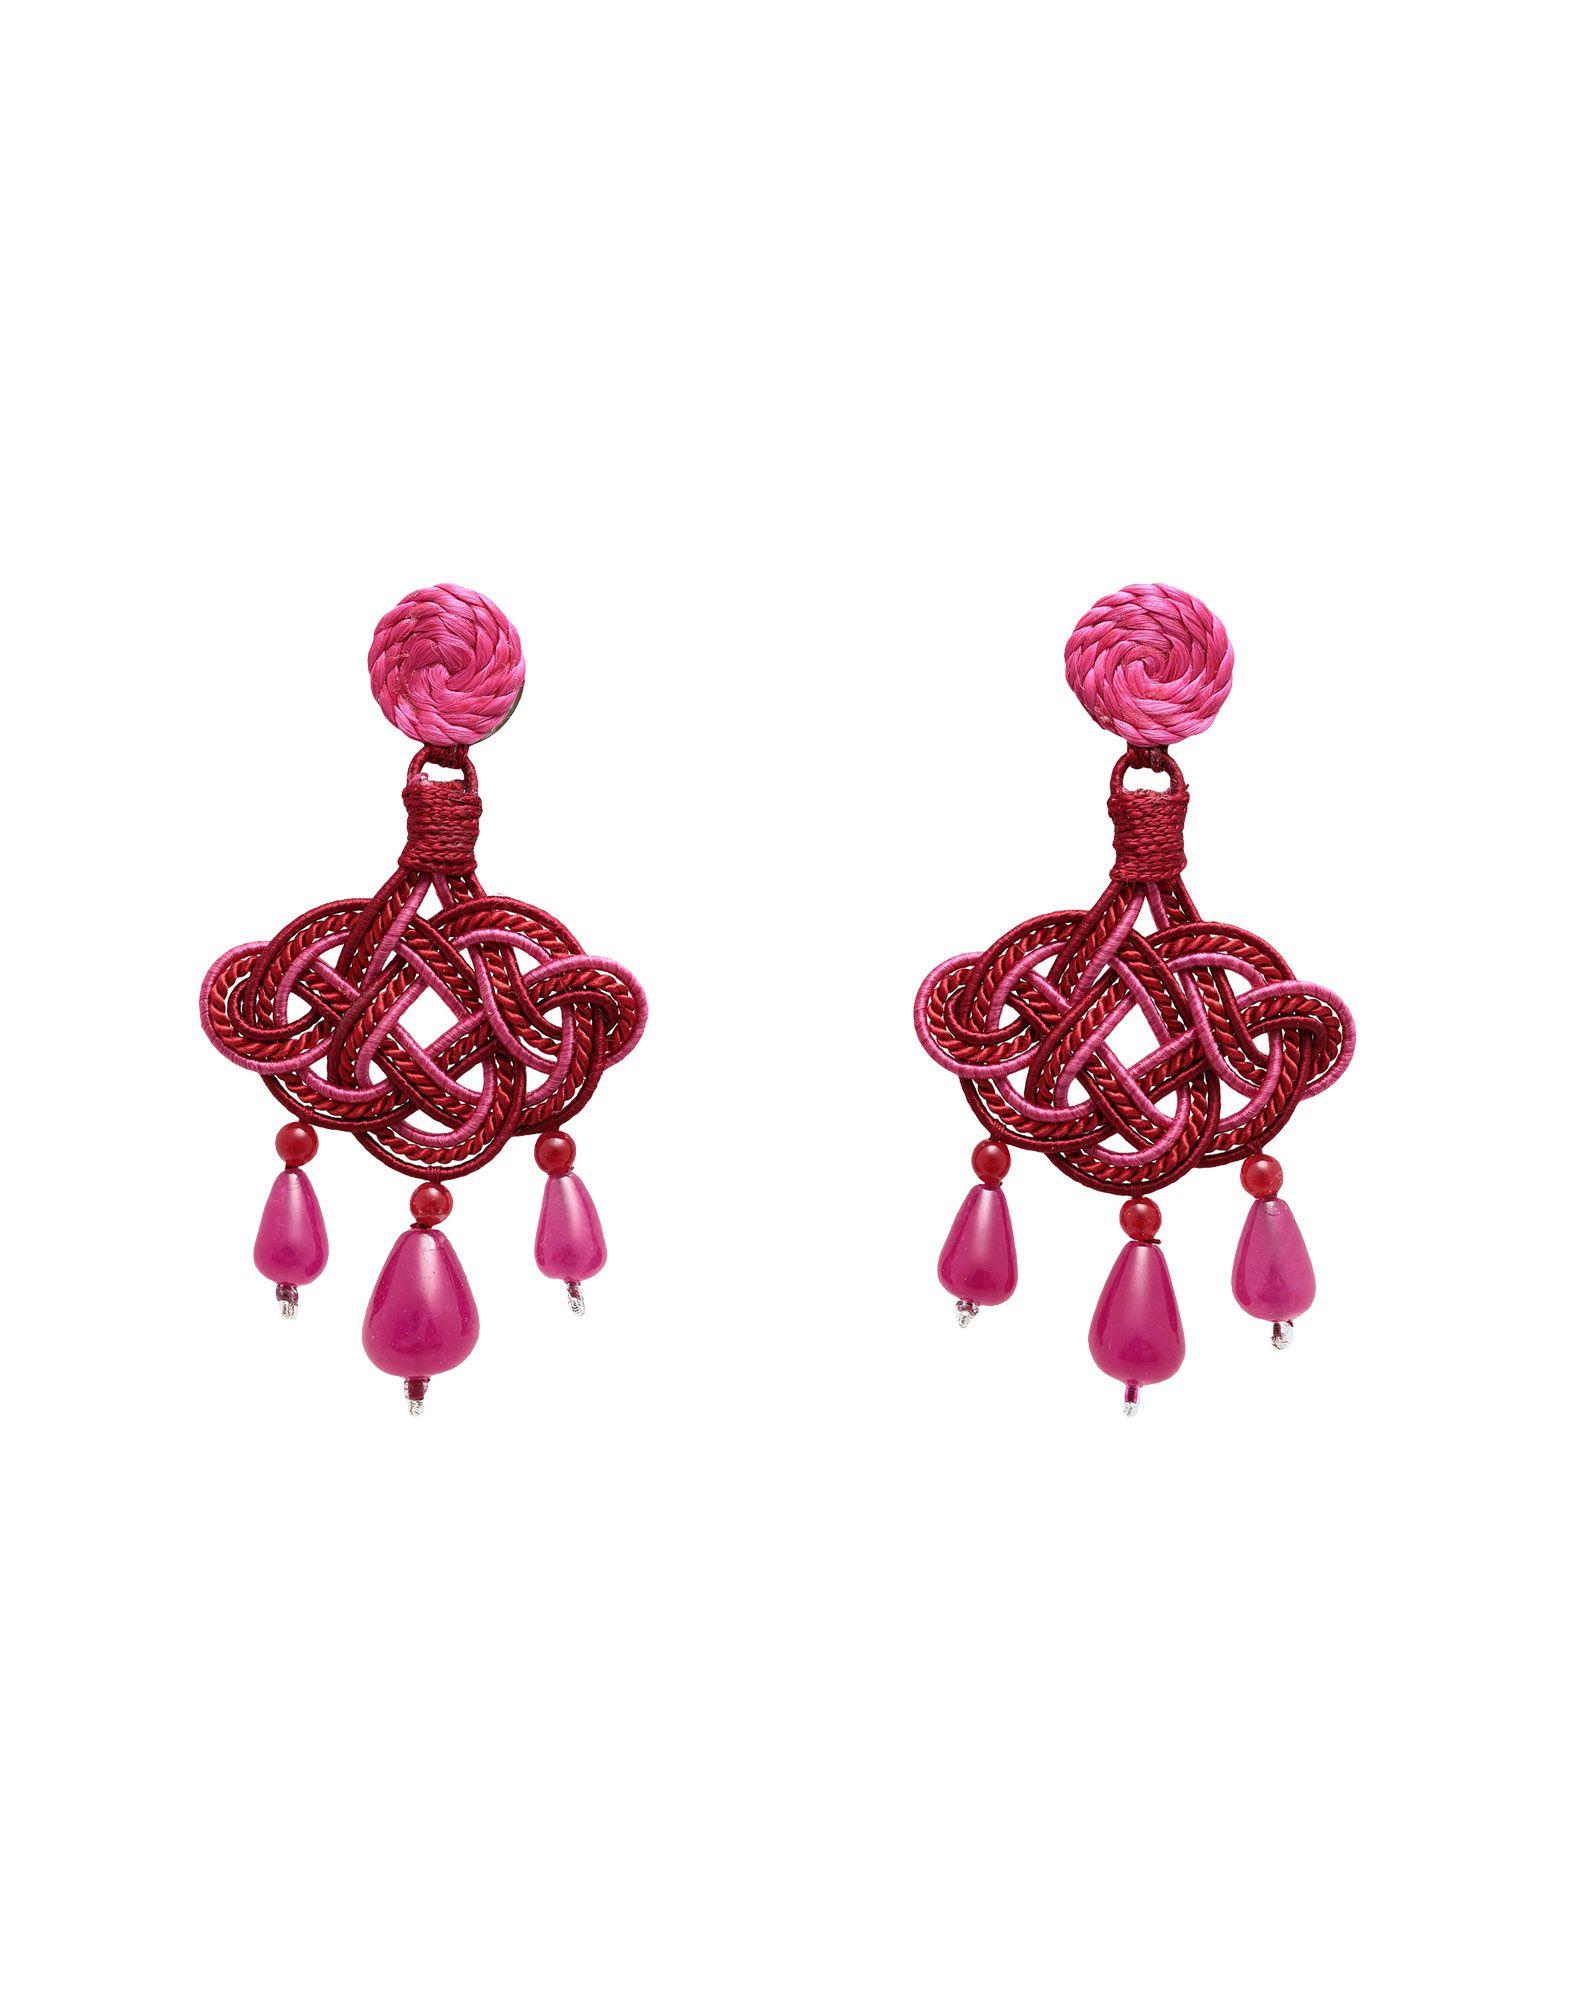 ANNA E ALEX Earrings in Burgundy